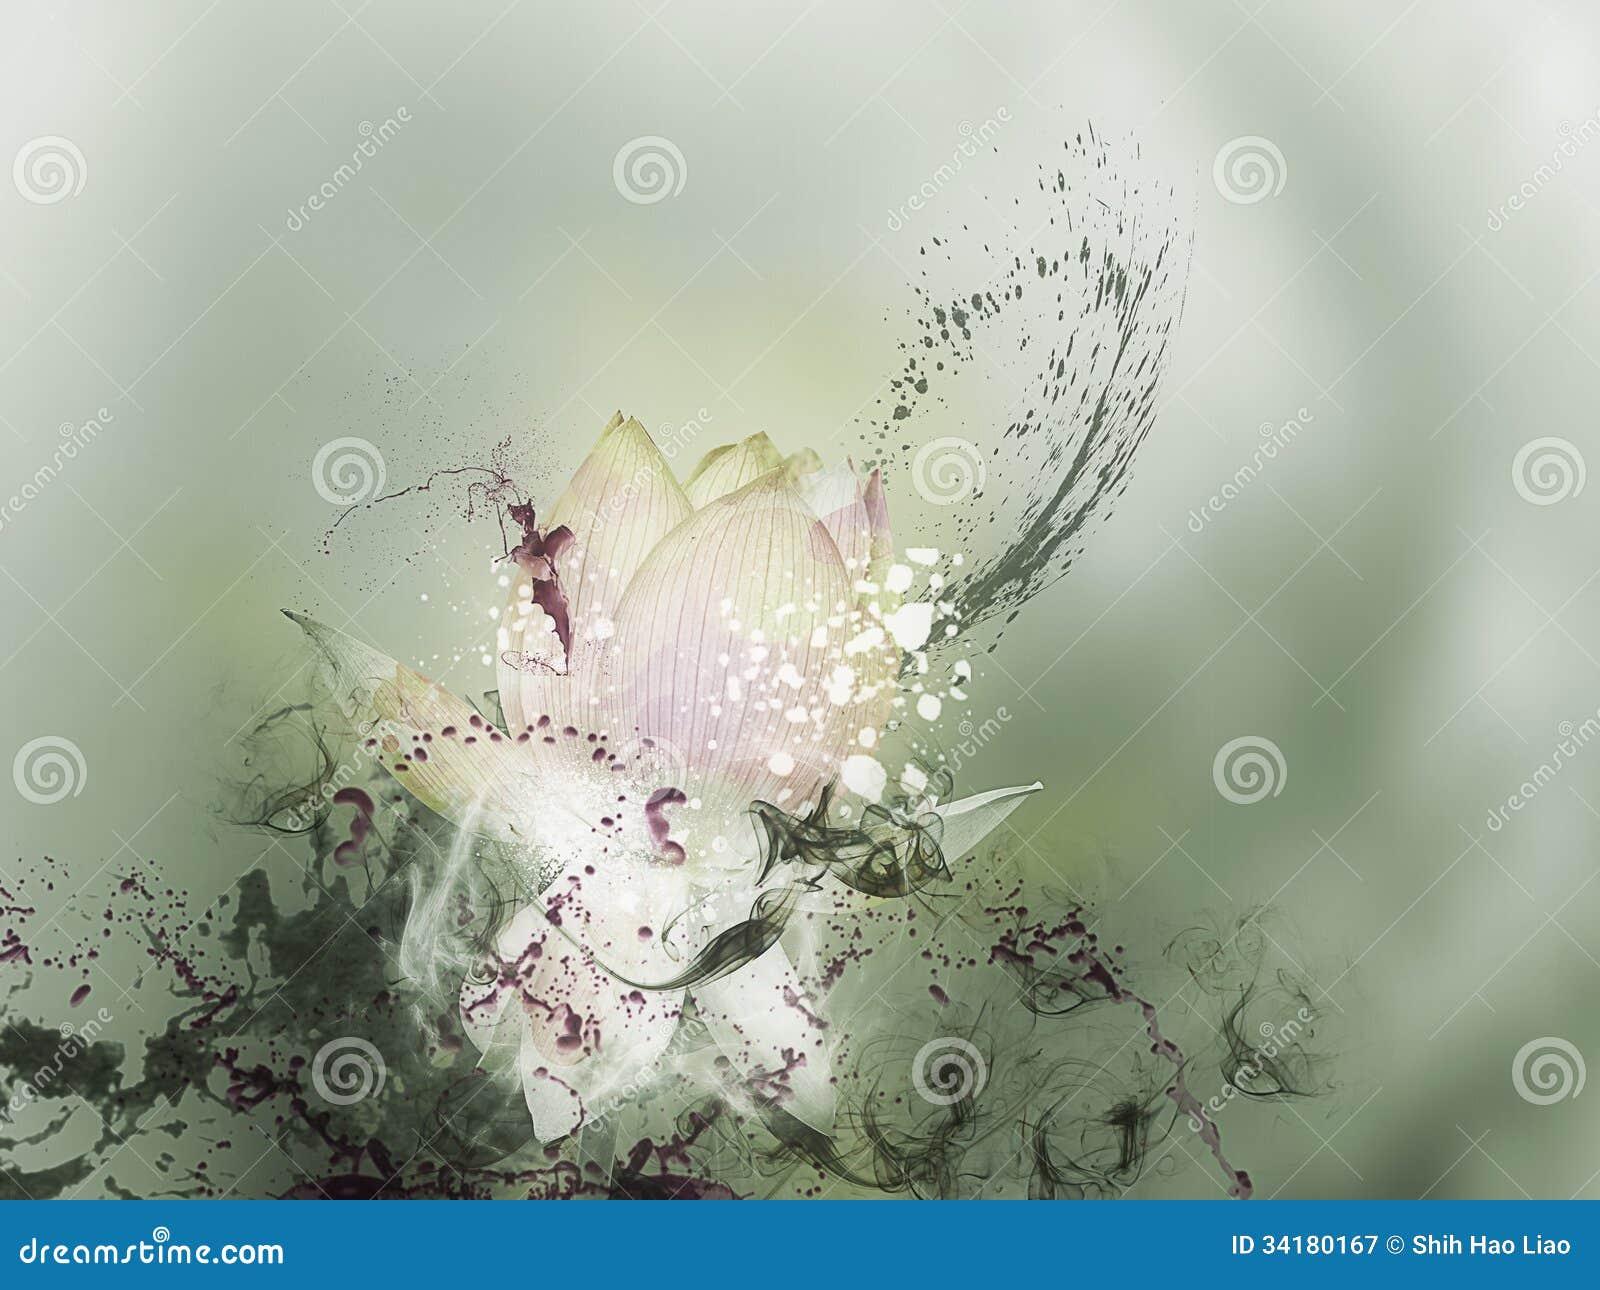 Painting Depicting Blooming Lotus Flower Stock Image Image Of